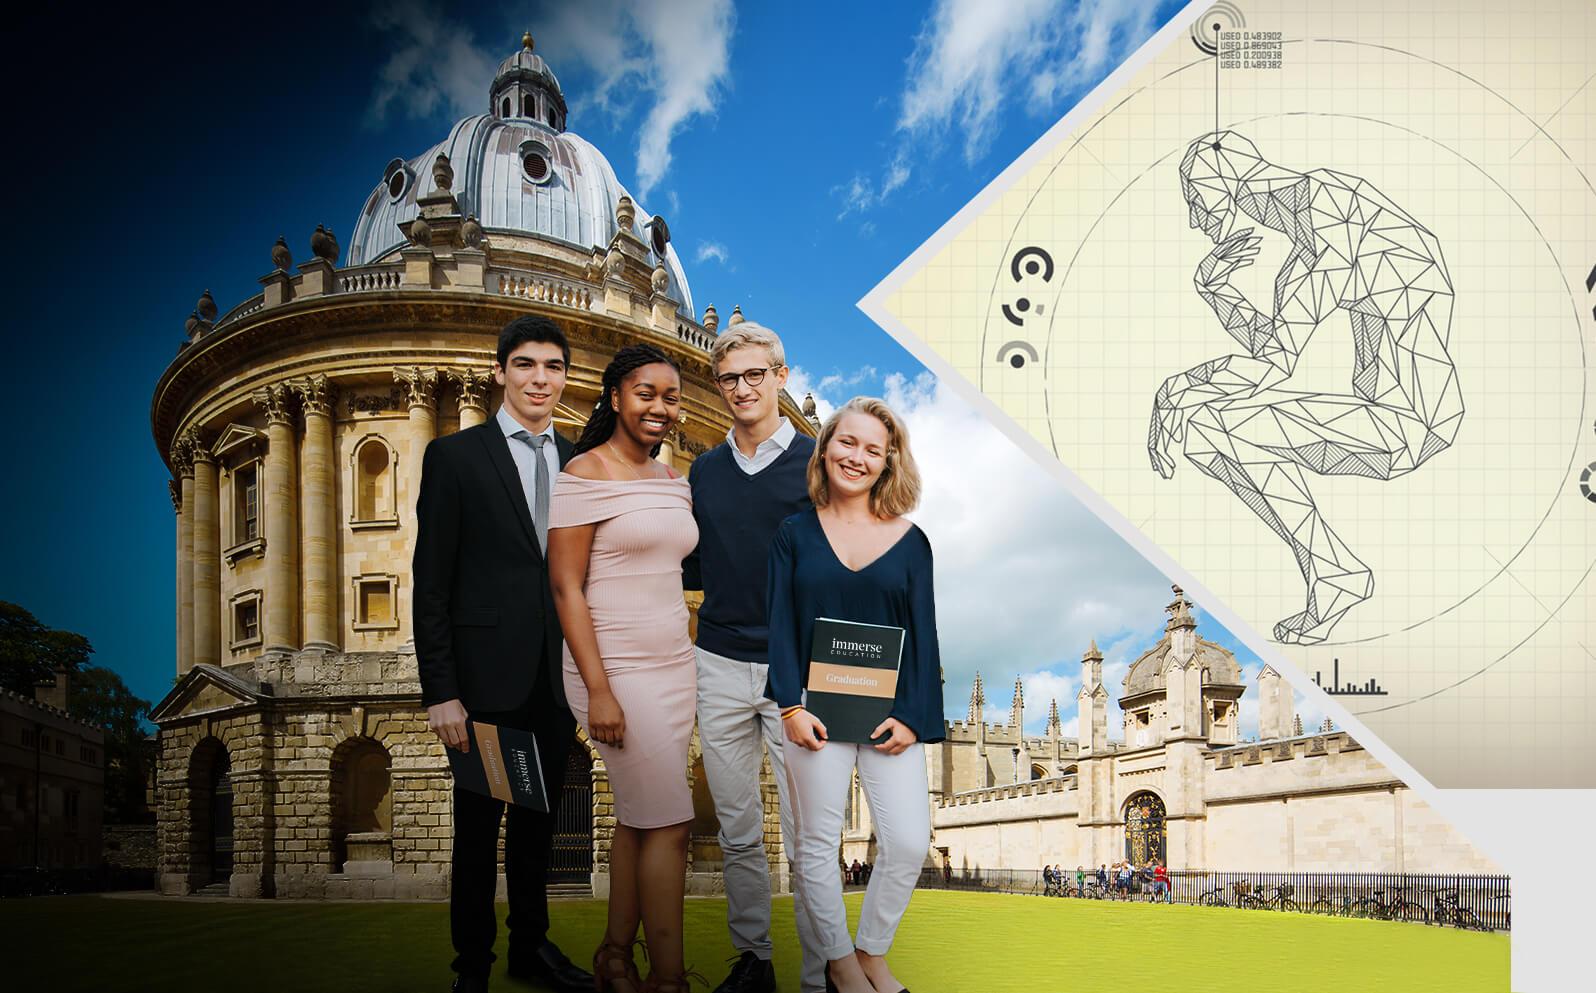 Oxford Philosophy Summer Program for Ages 16-18